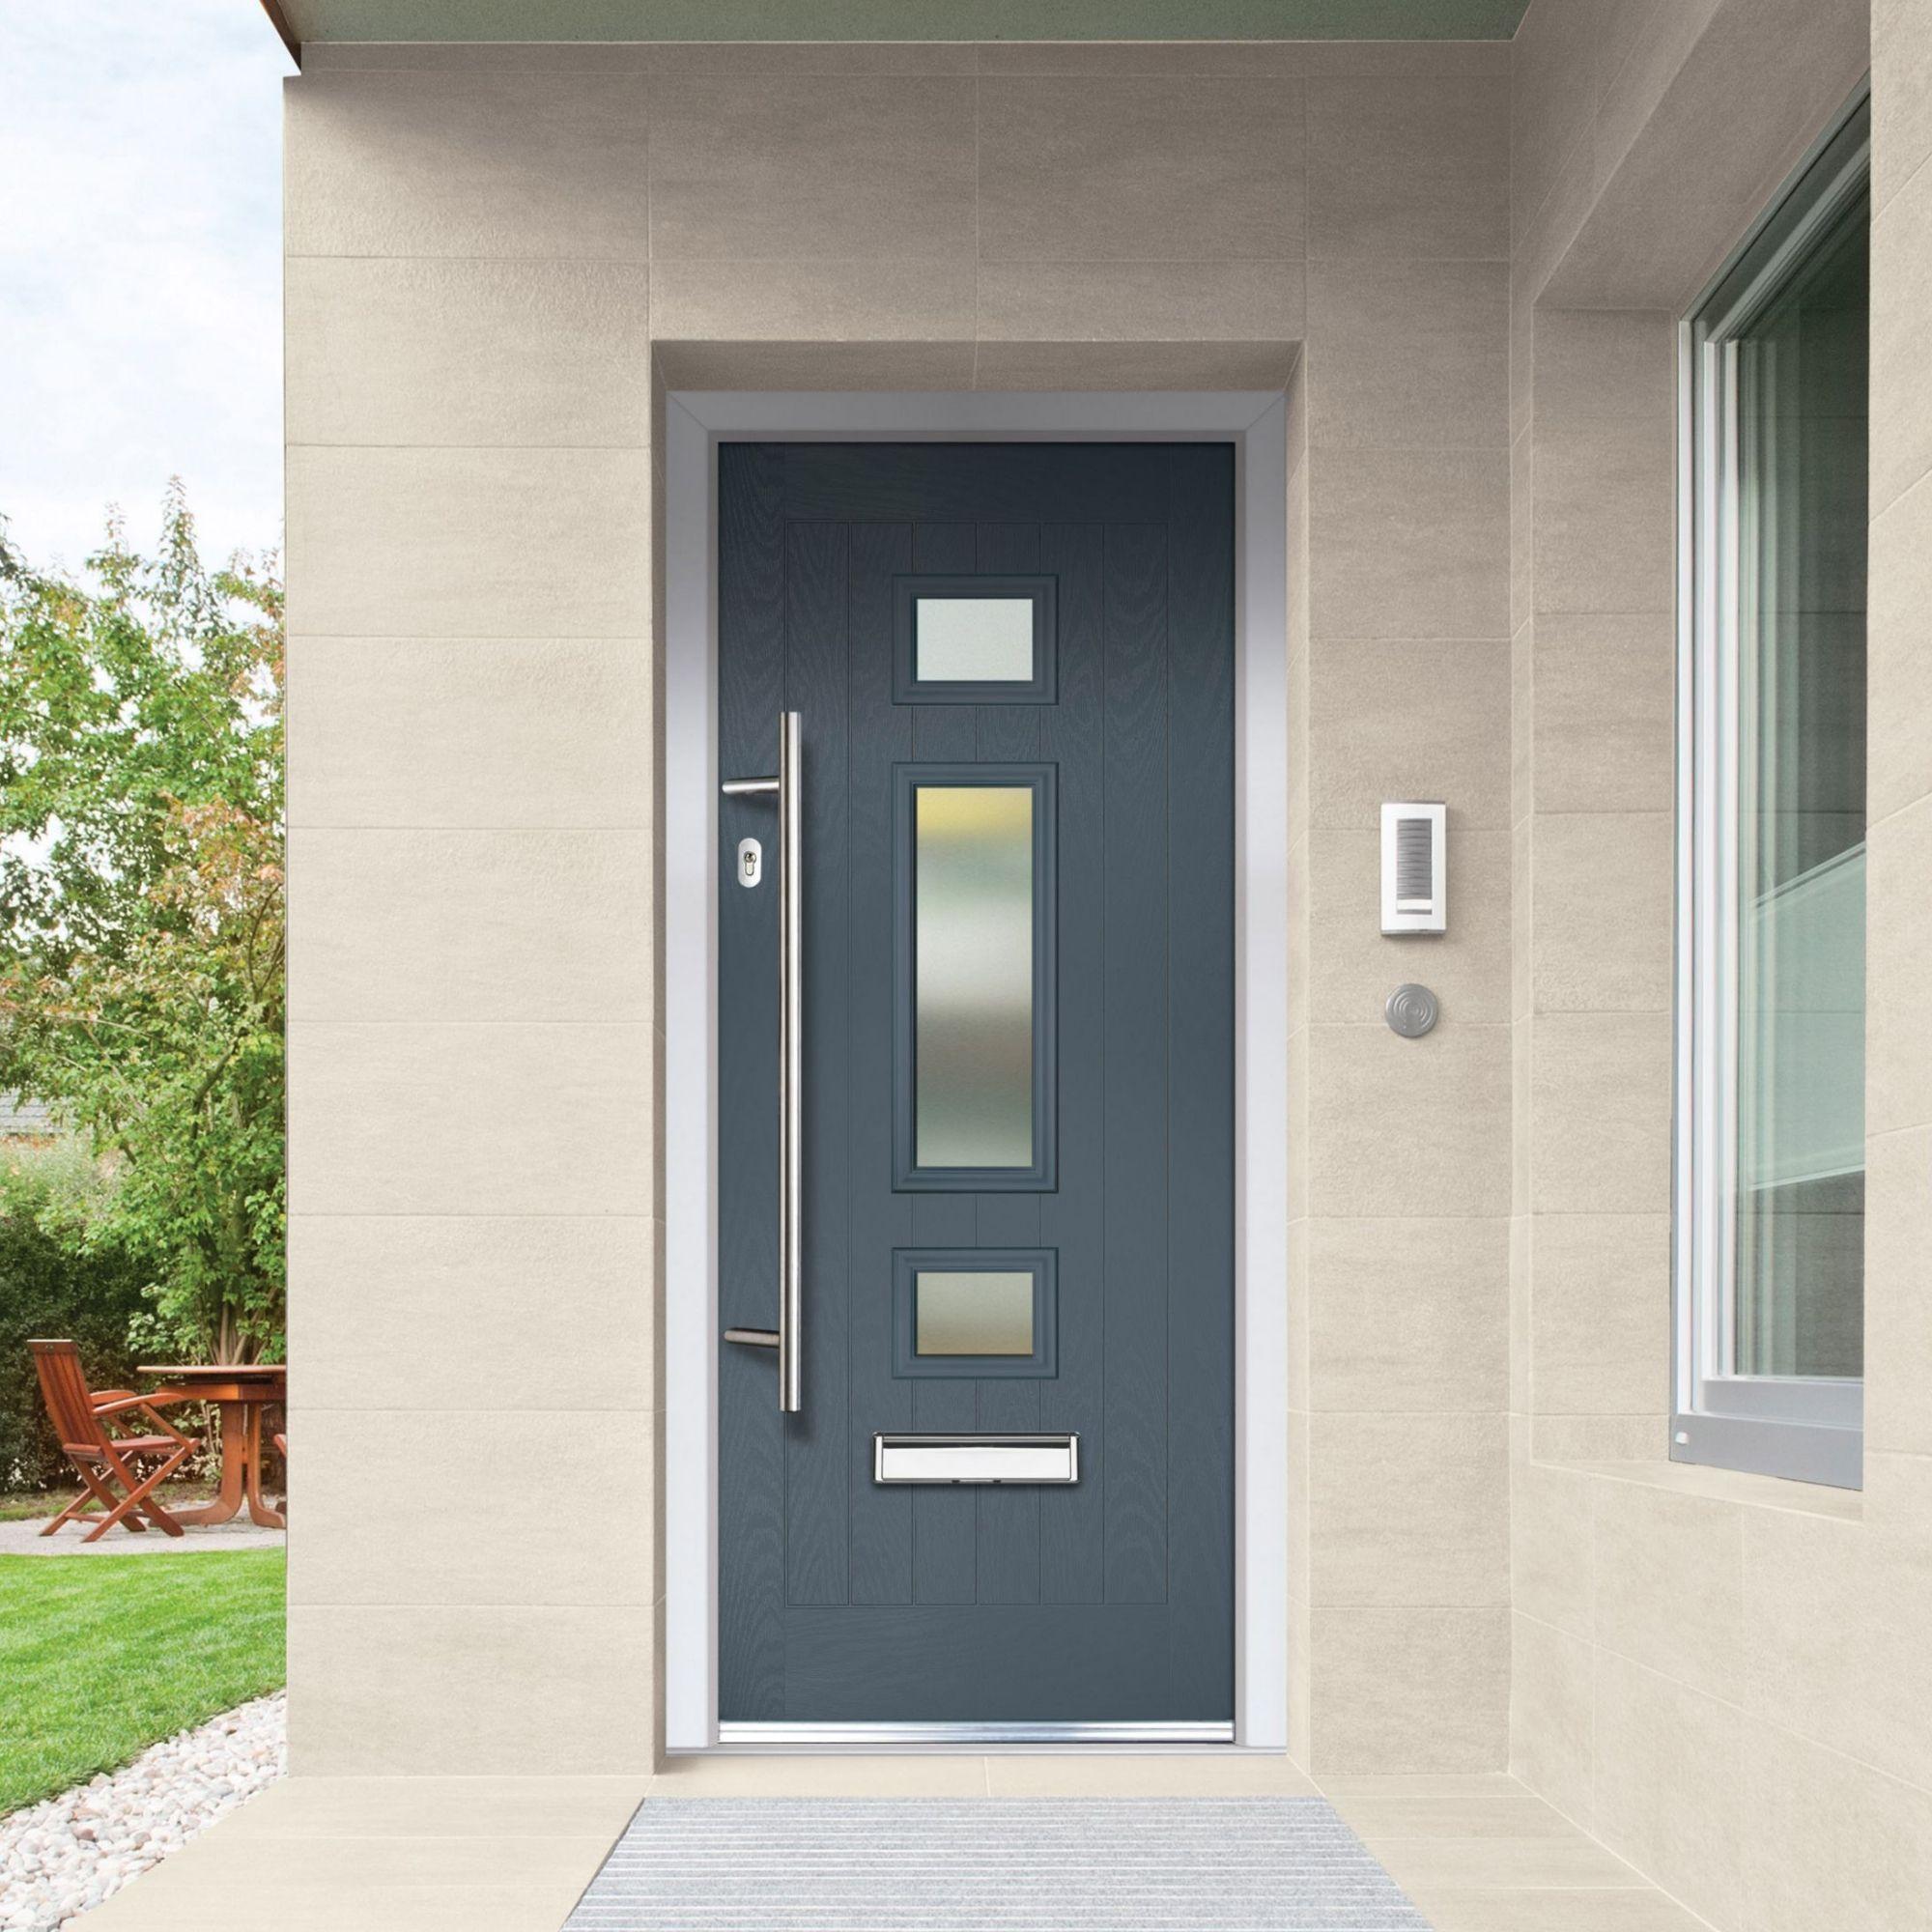 Crystal 3 Panel Frosted Glazed Grey Composite Rh External Front Door Set H 2055mm W 920mm In 2020 External Front Doors Composite Front Door Front Door